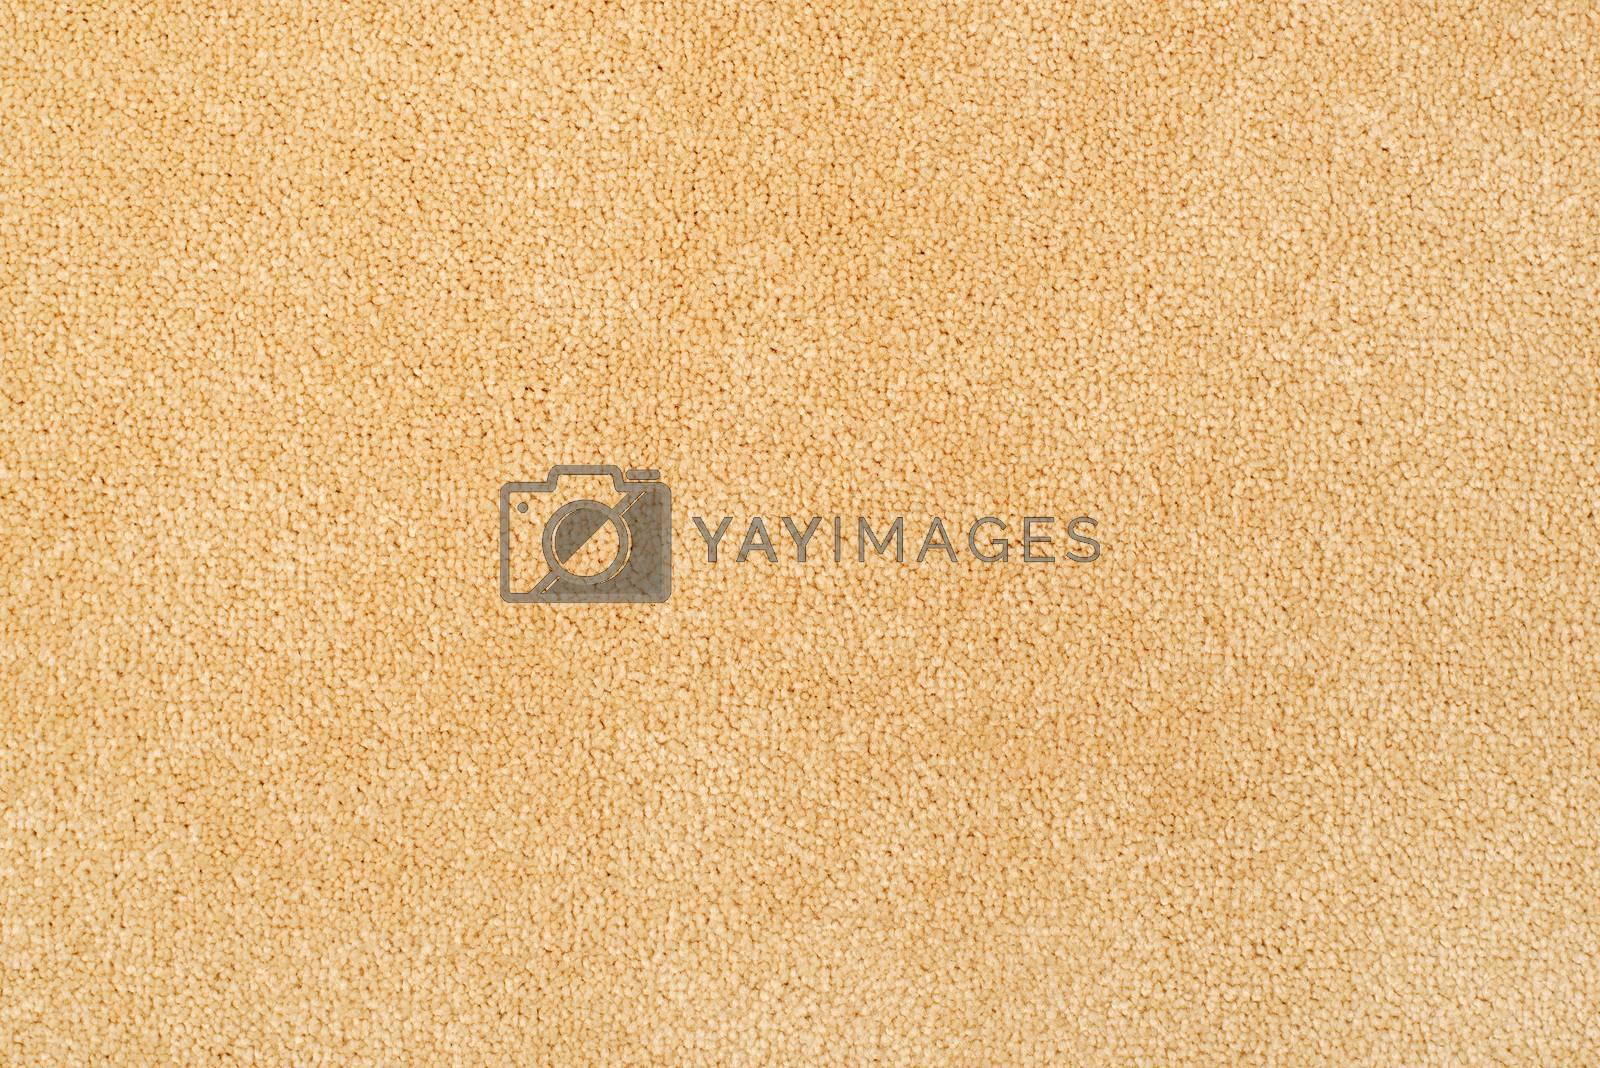 New carpet texture. Bright carpet flooring as seamless background.